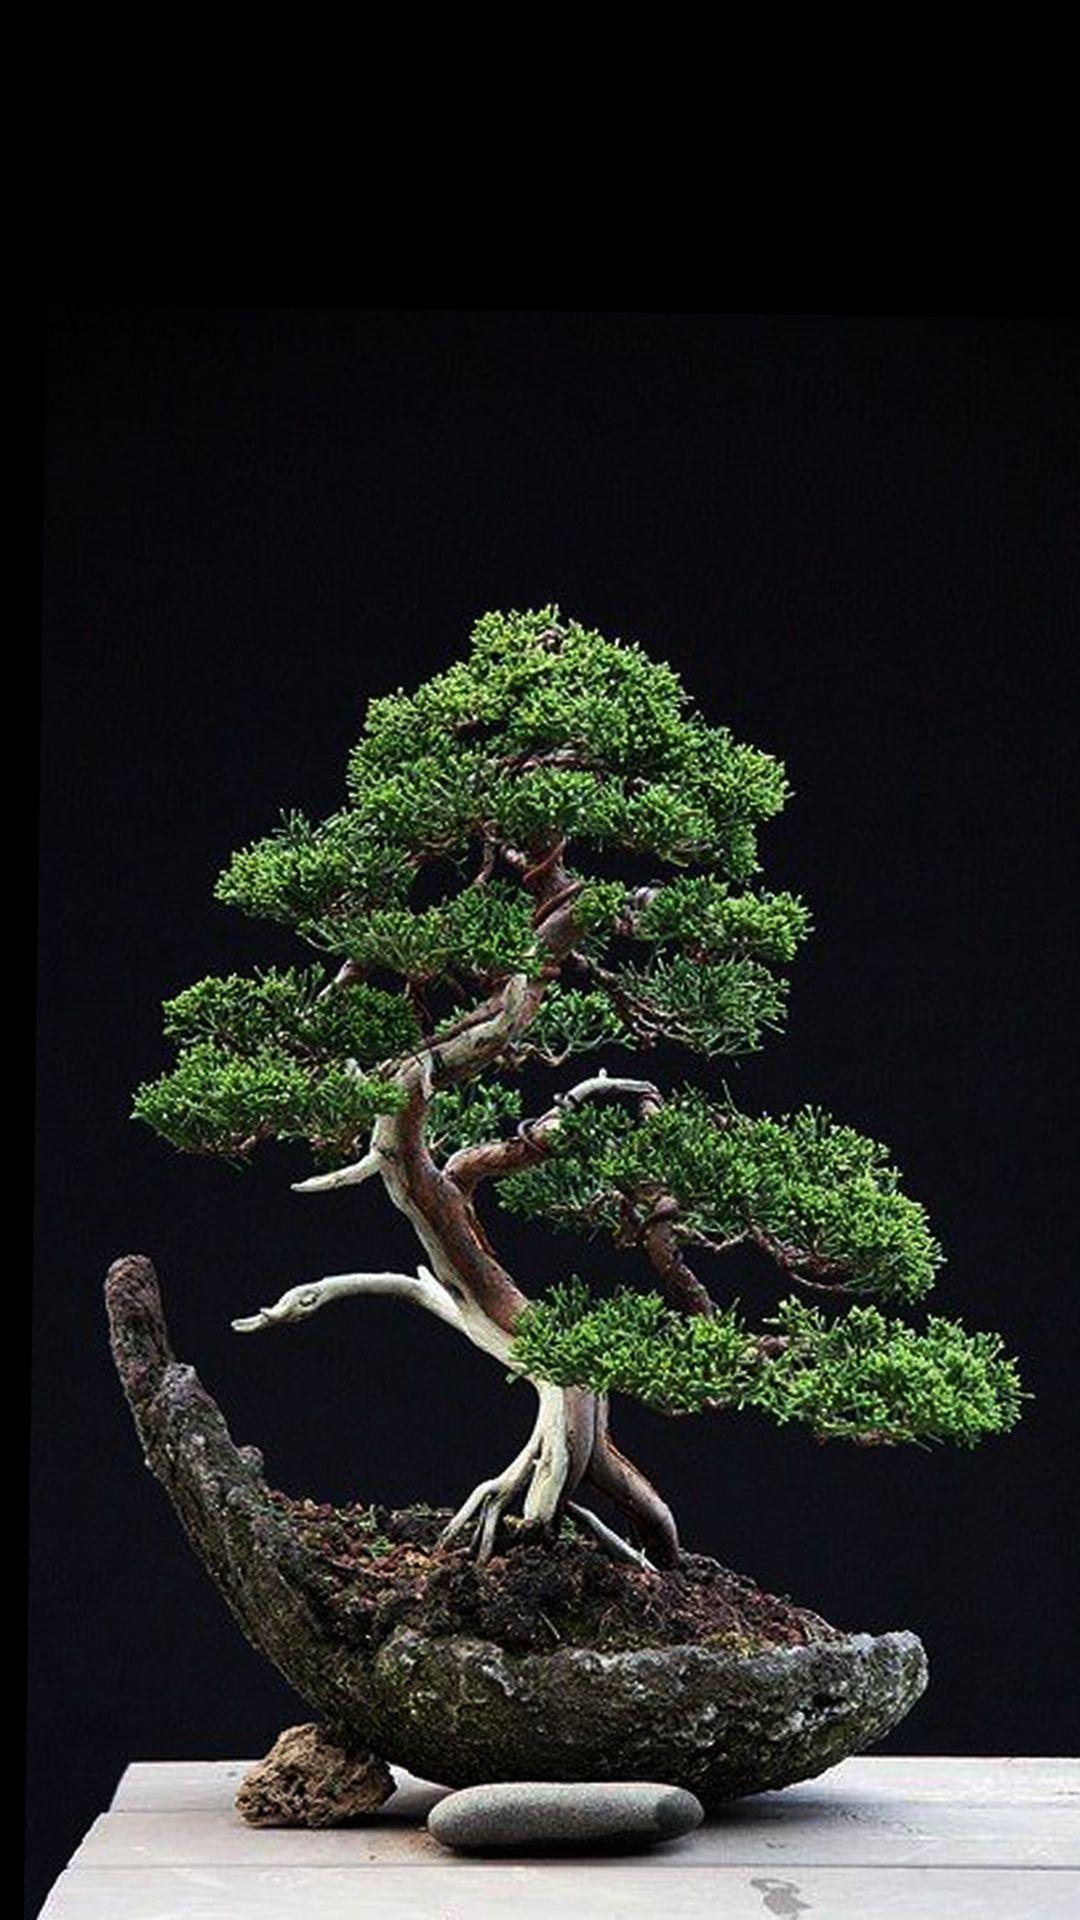 Juniper Tree Wallpapers - Top Free Juniper Tree ...